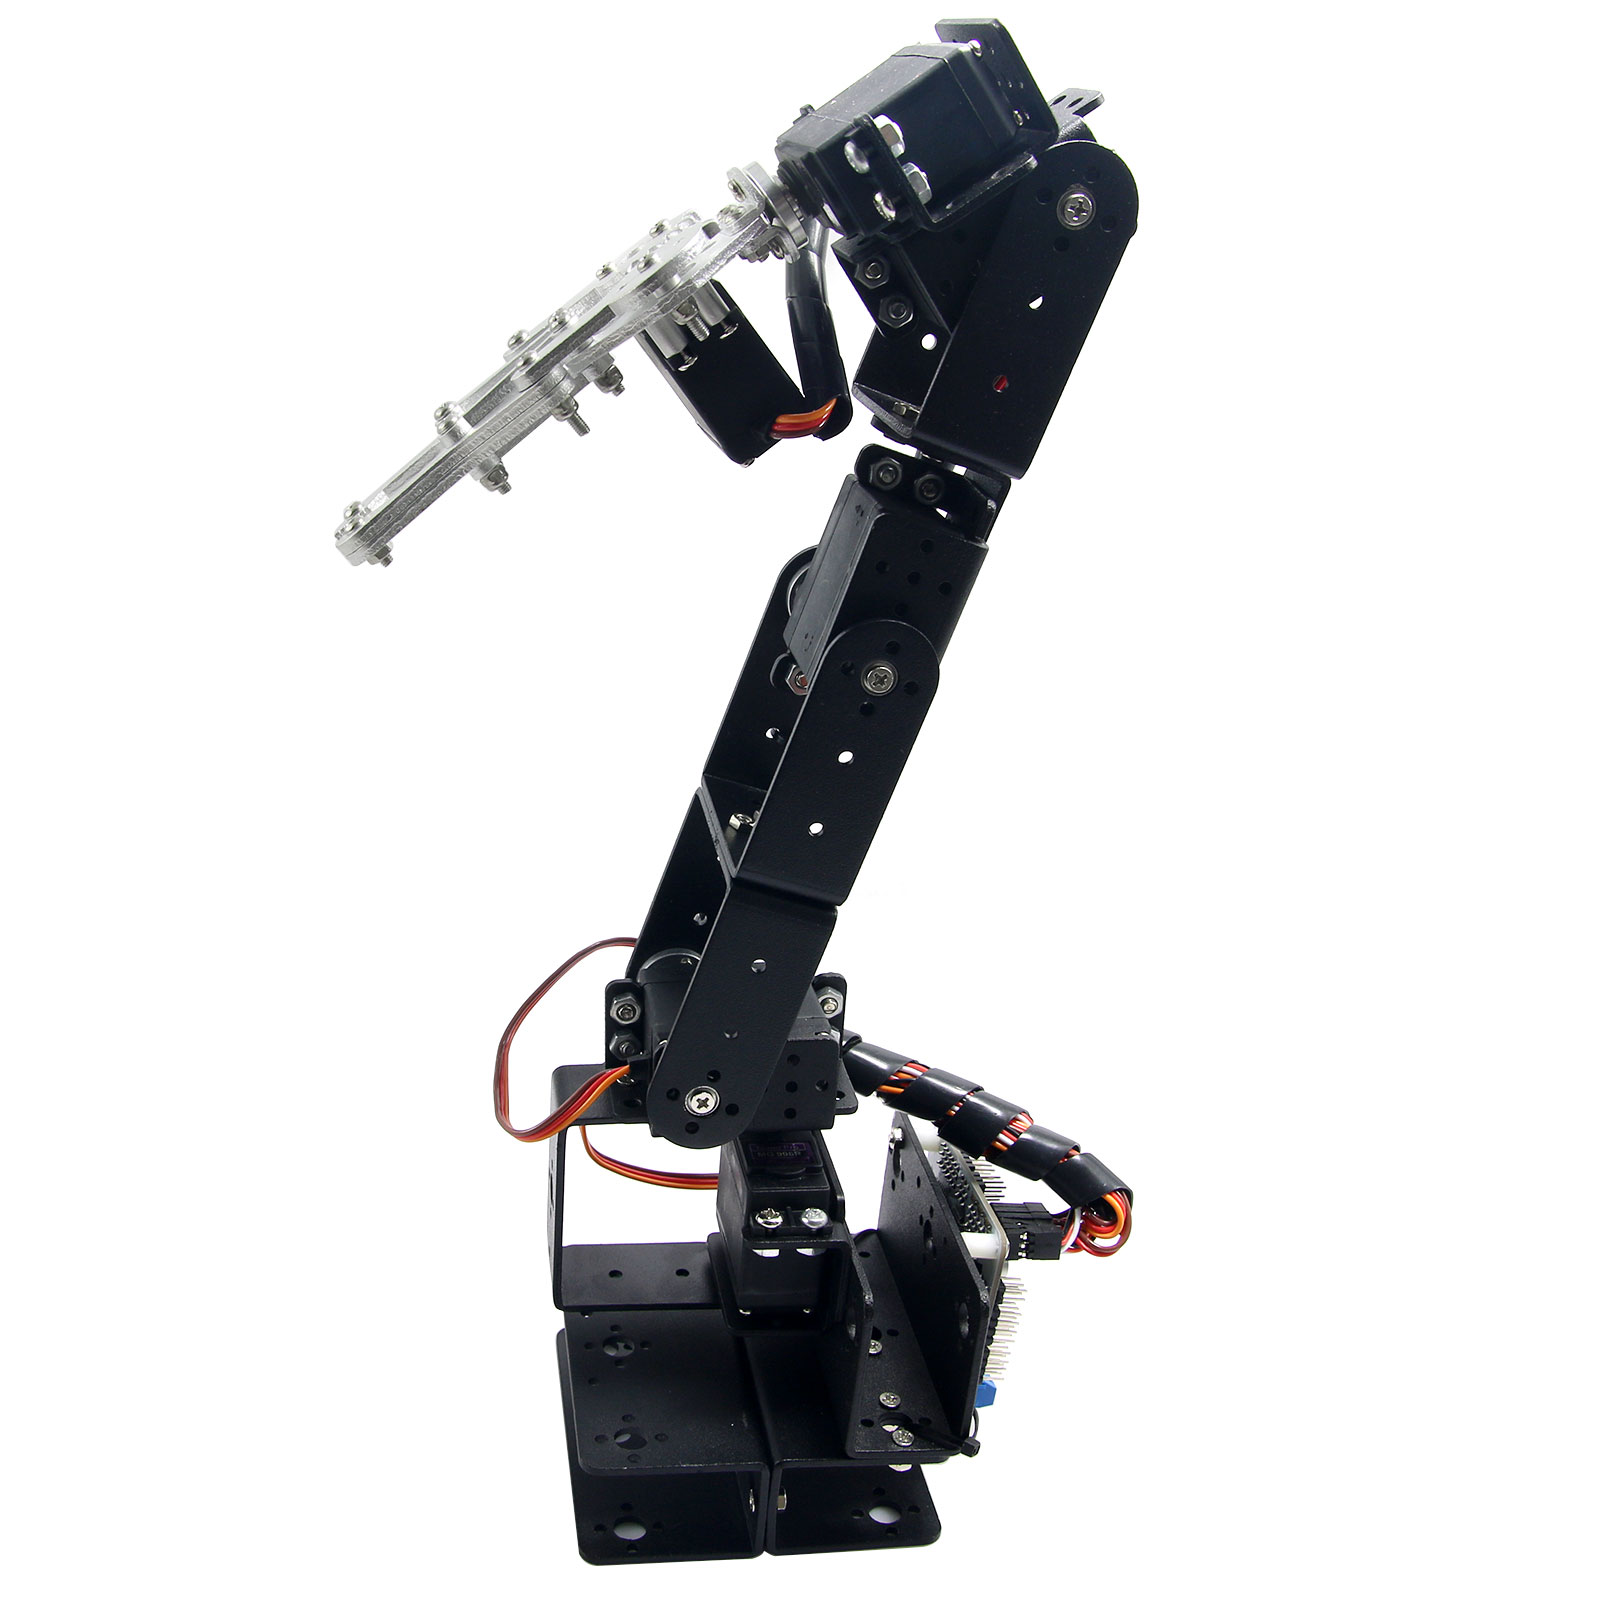 Robot 6 DOF Aluminium Clamp Claw Mount kit Mechanical Robotic Arm & MG996R Servos & 32 CH Controller for Arduino 6 dof robot arm six axis manipulators industrial robot model robot without controller mg996r